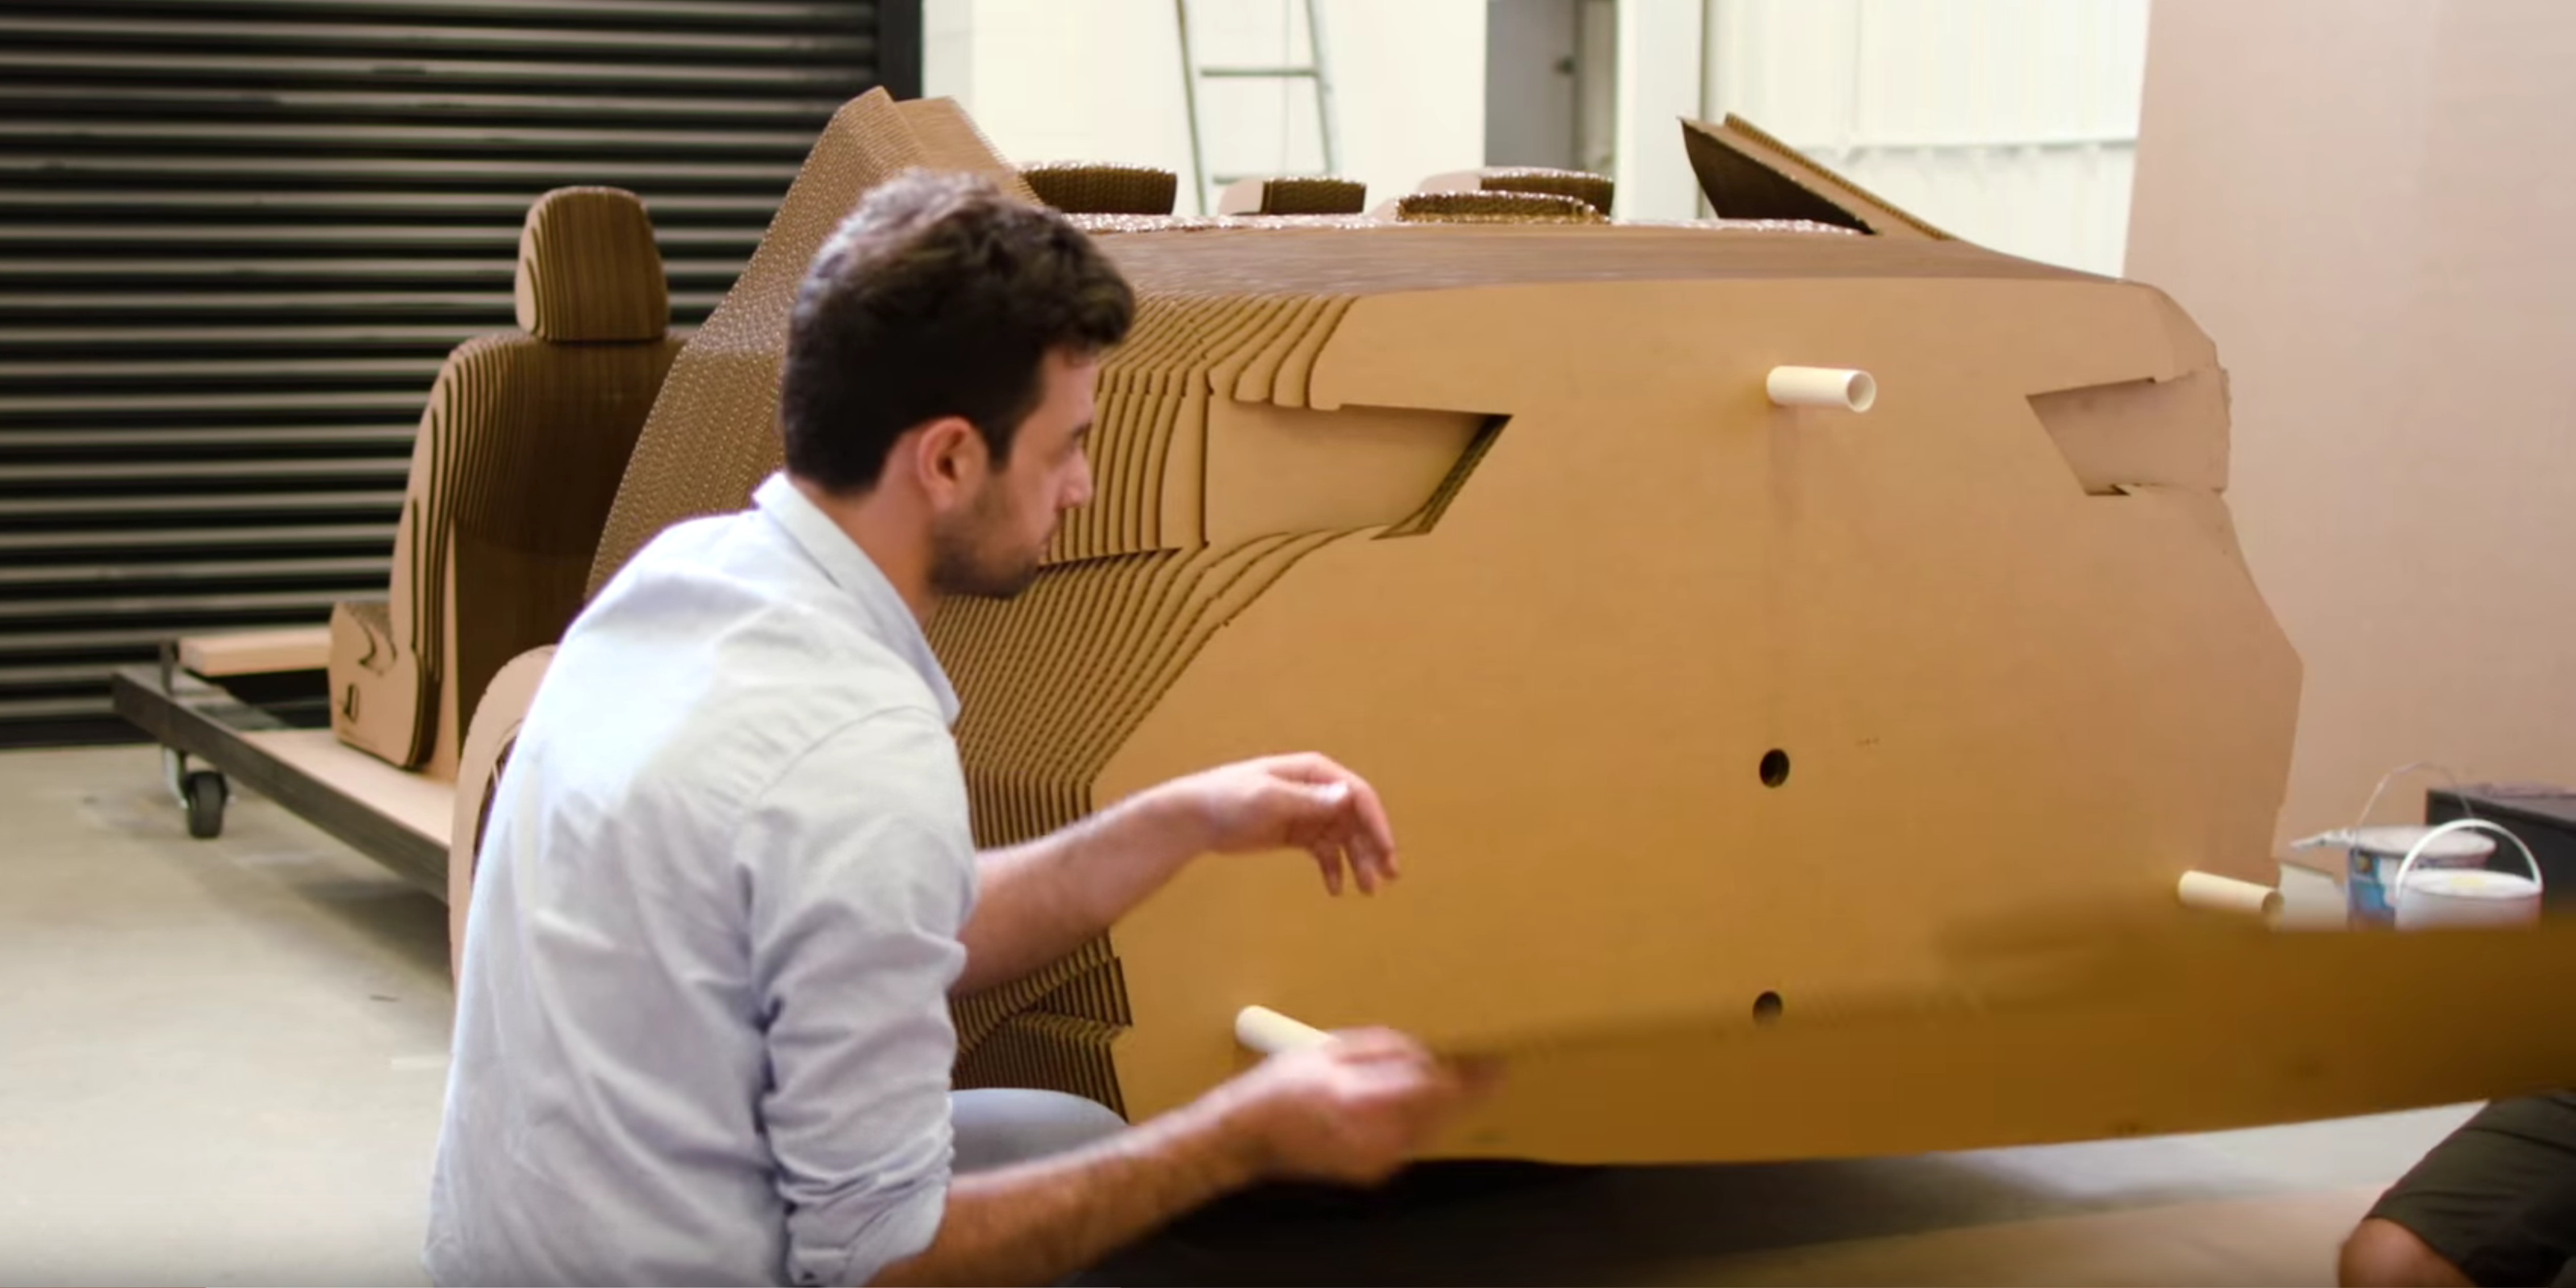 cardboard-car-assembly